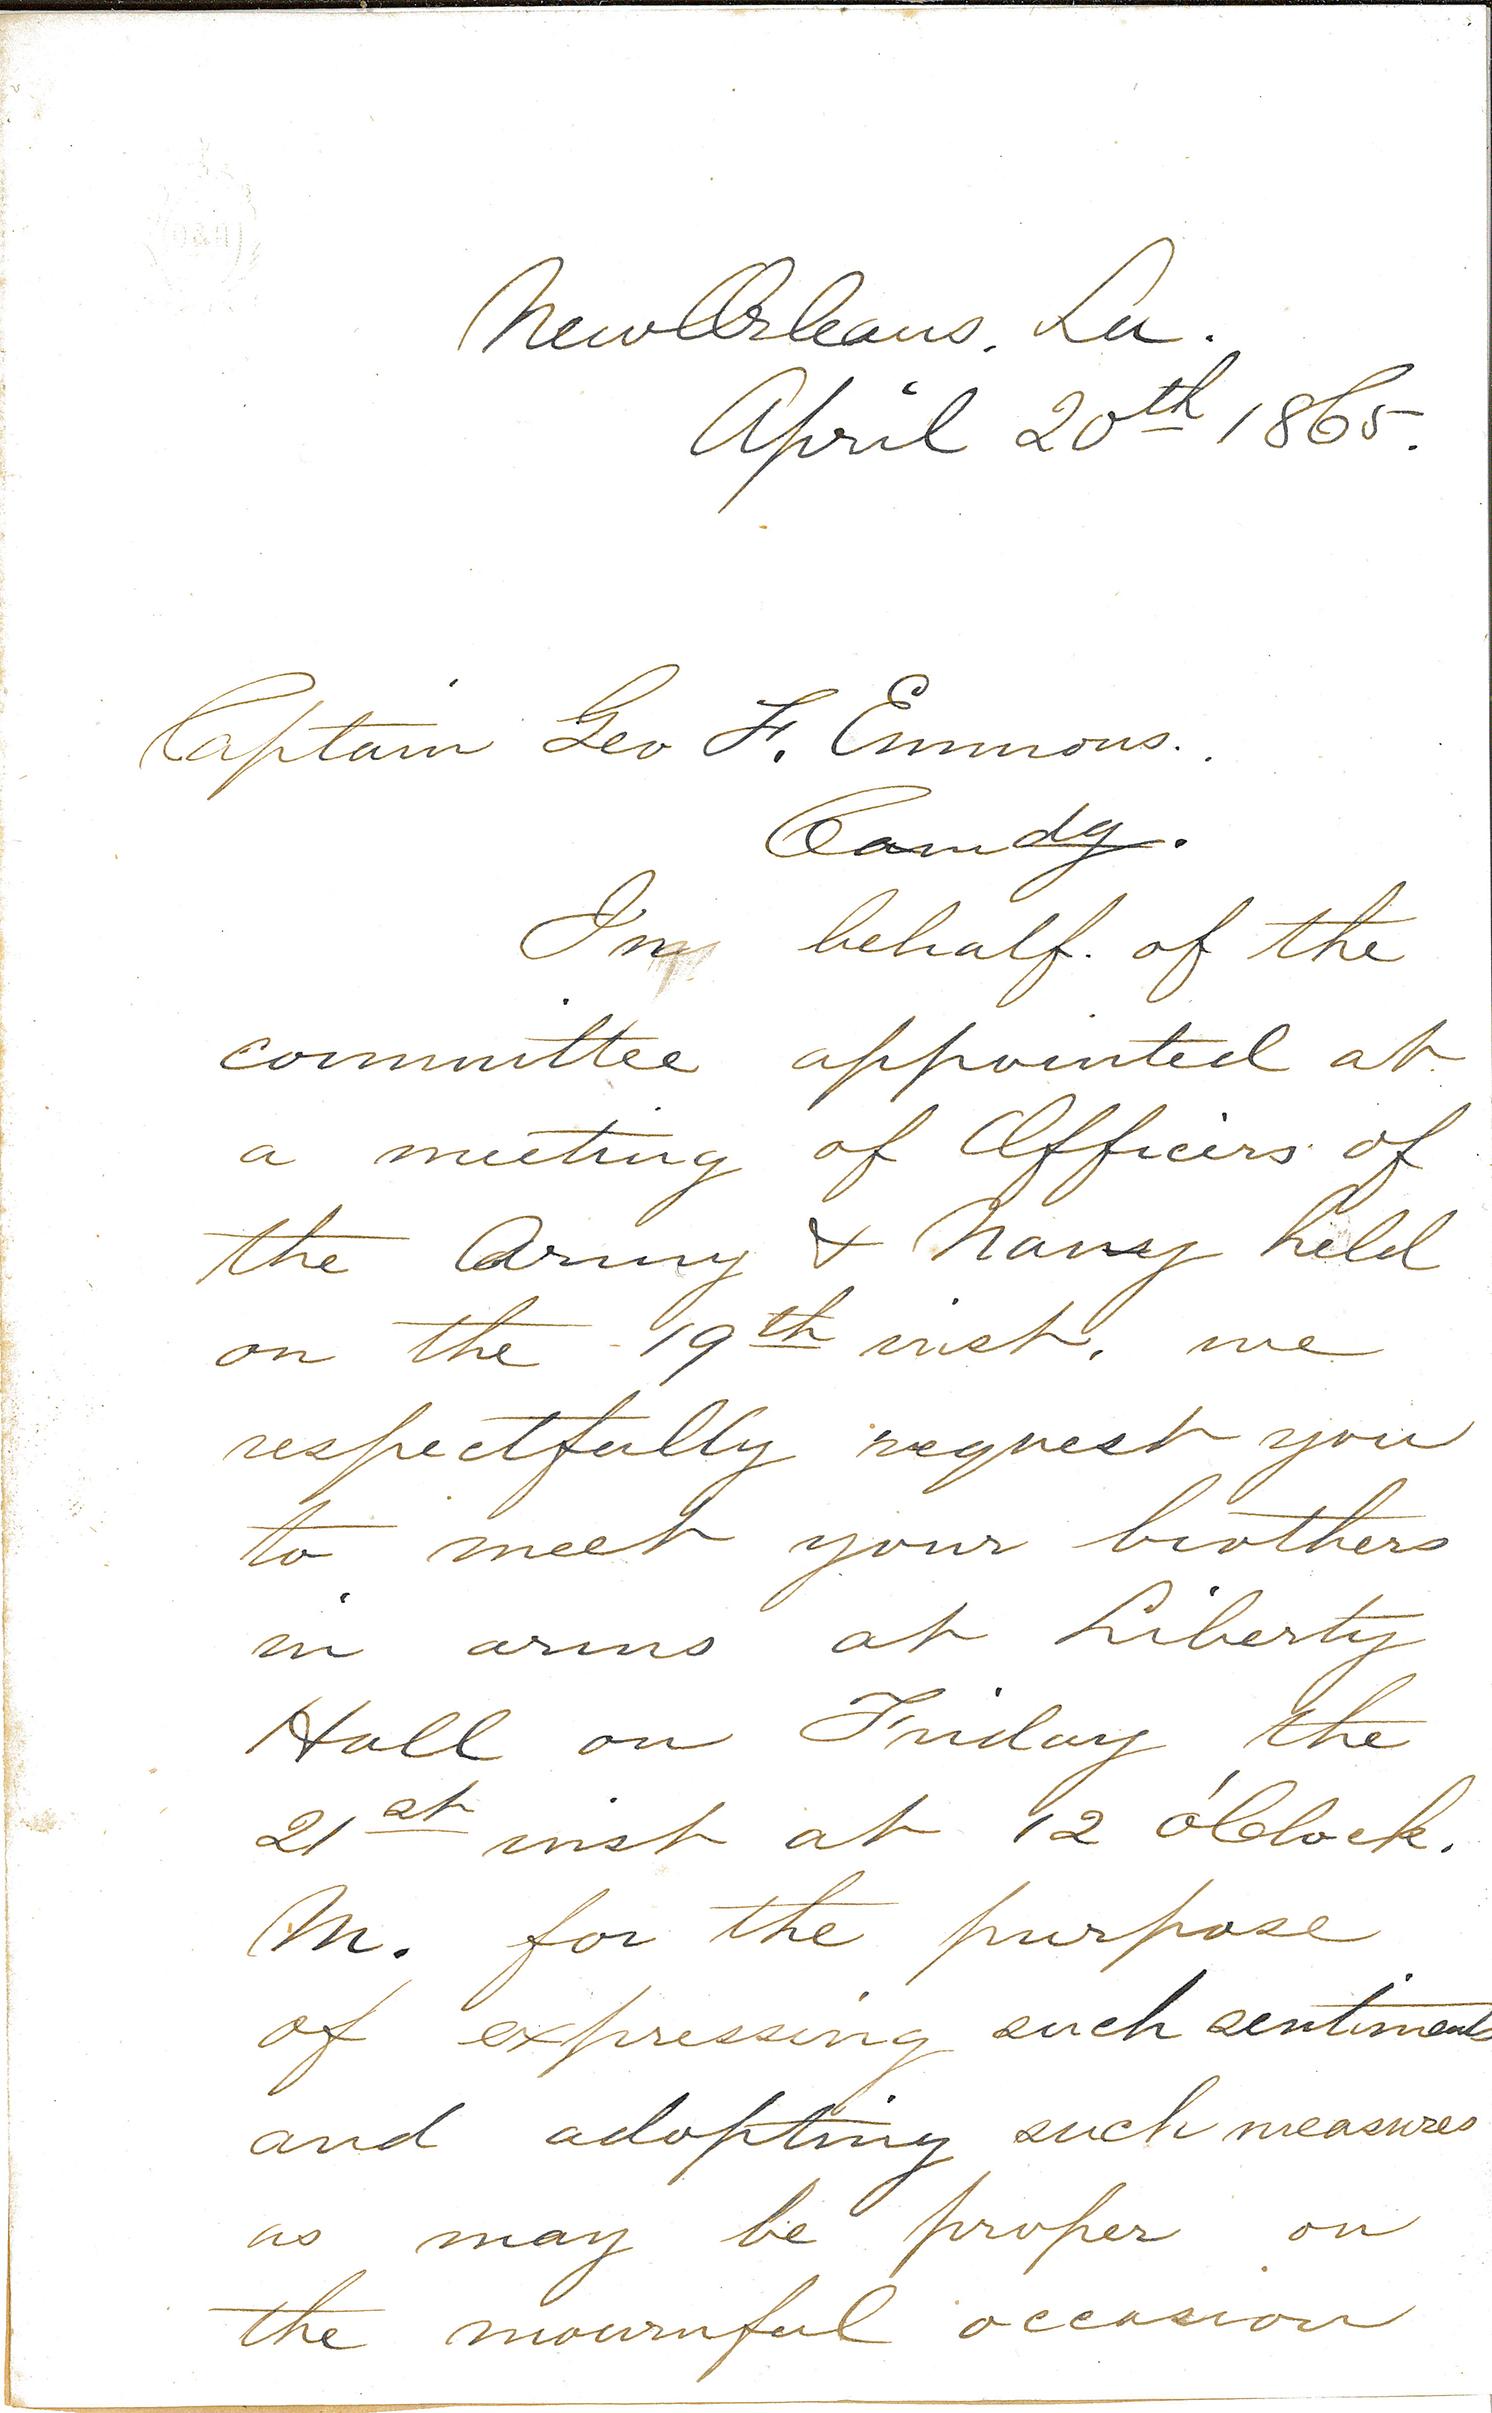 Letter- New Orleans April 20 1865